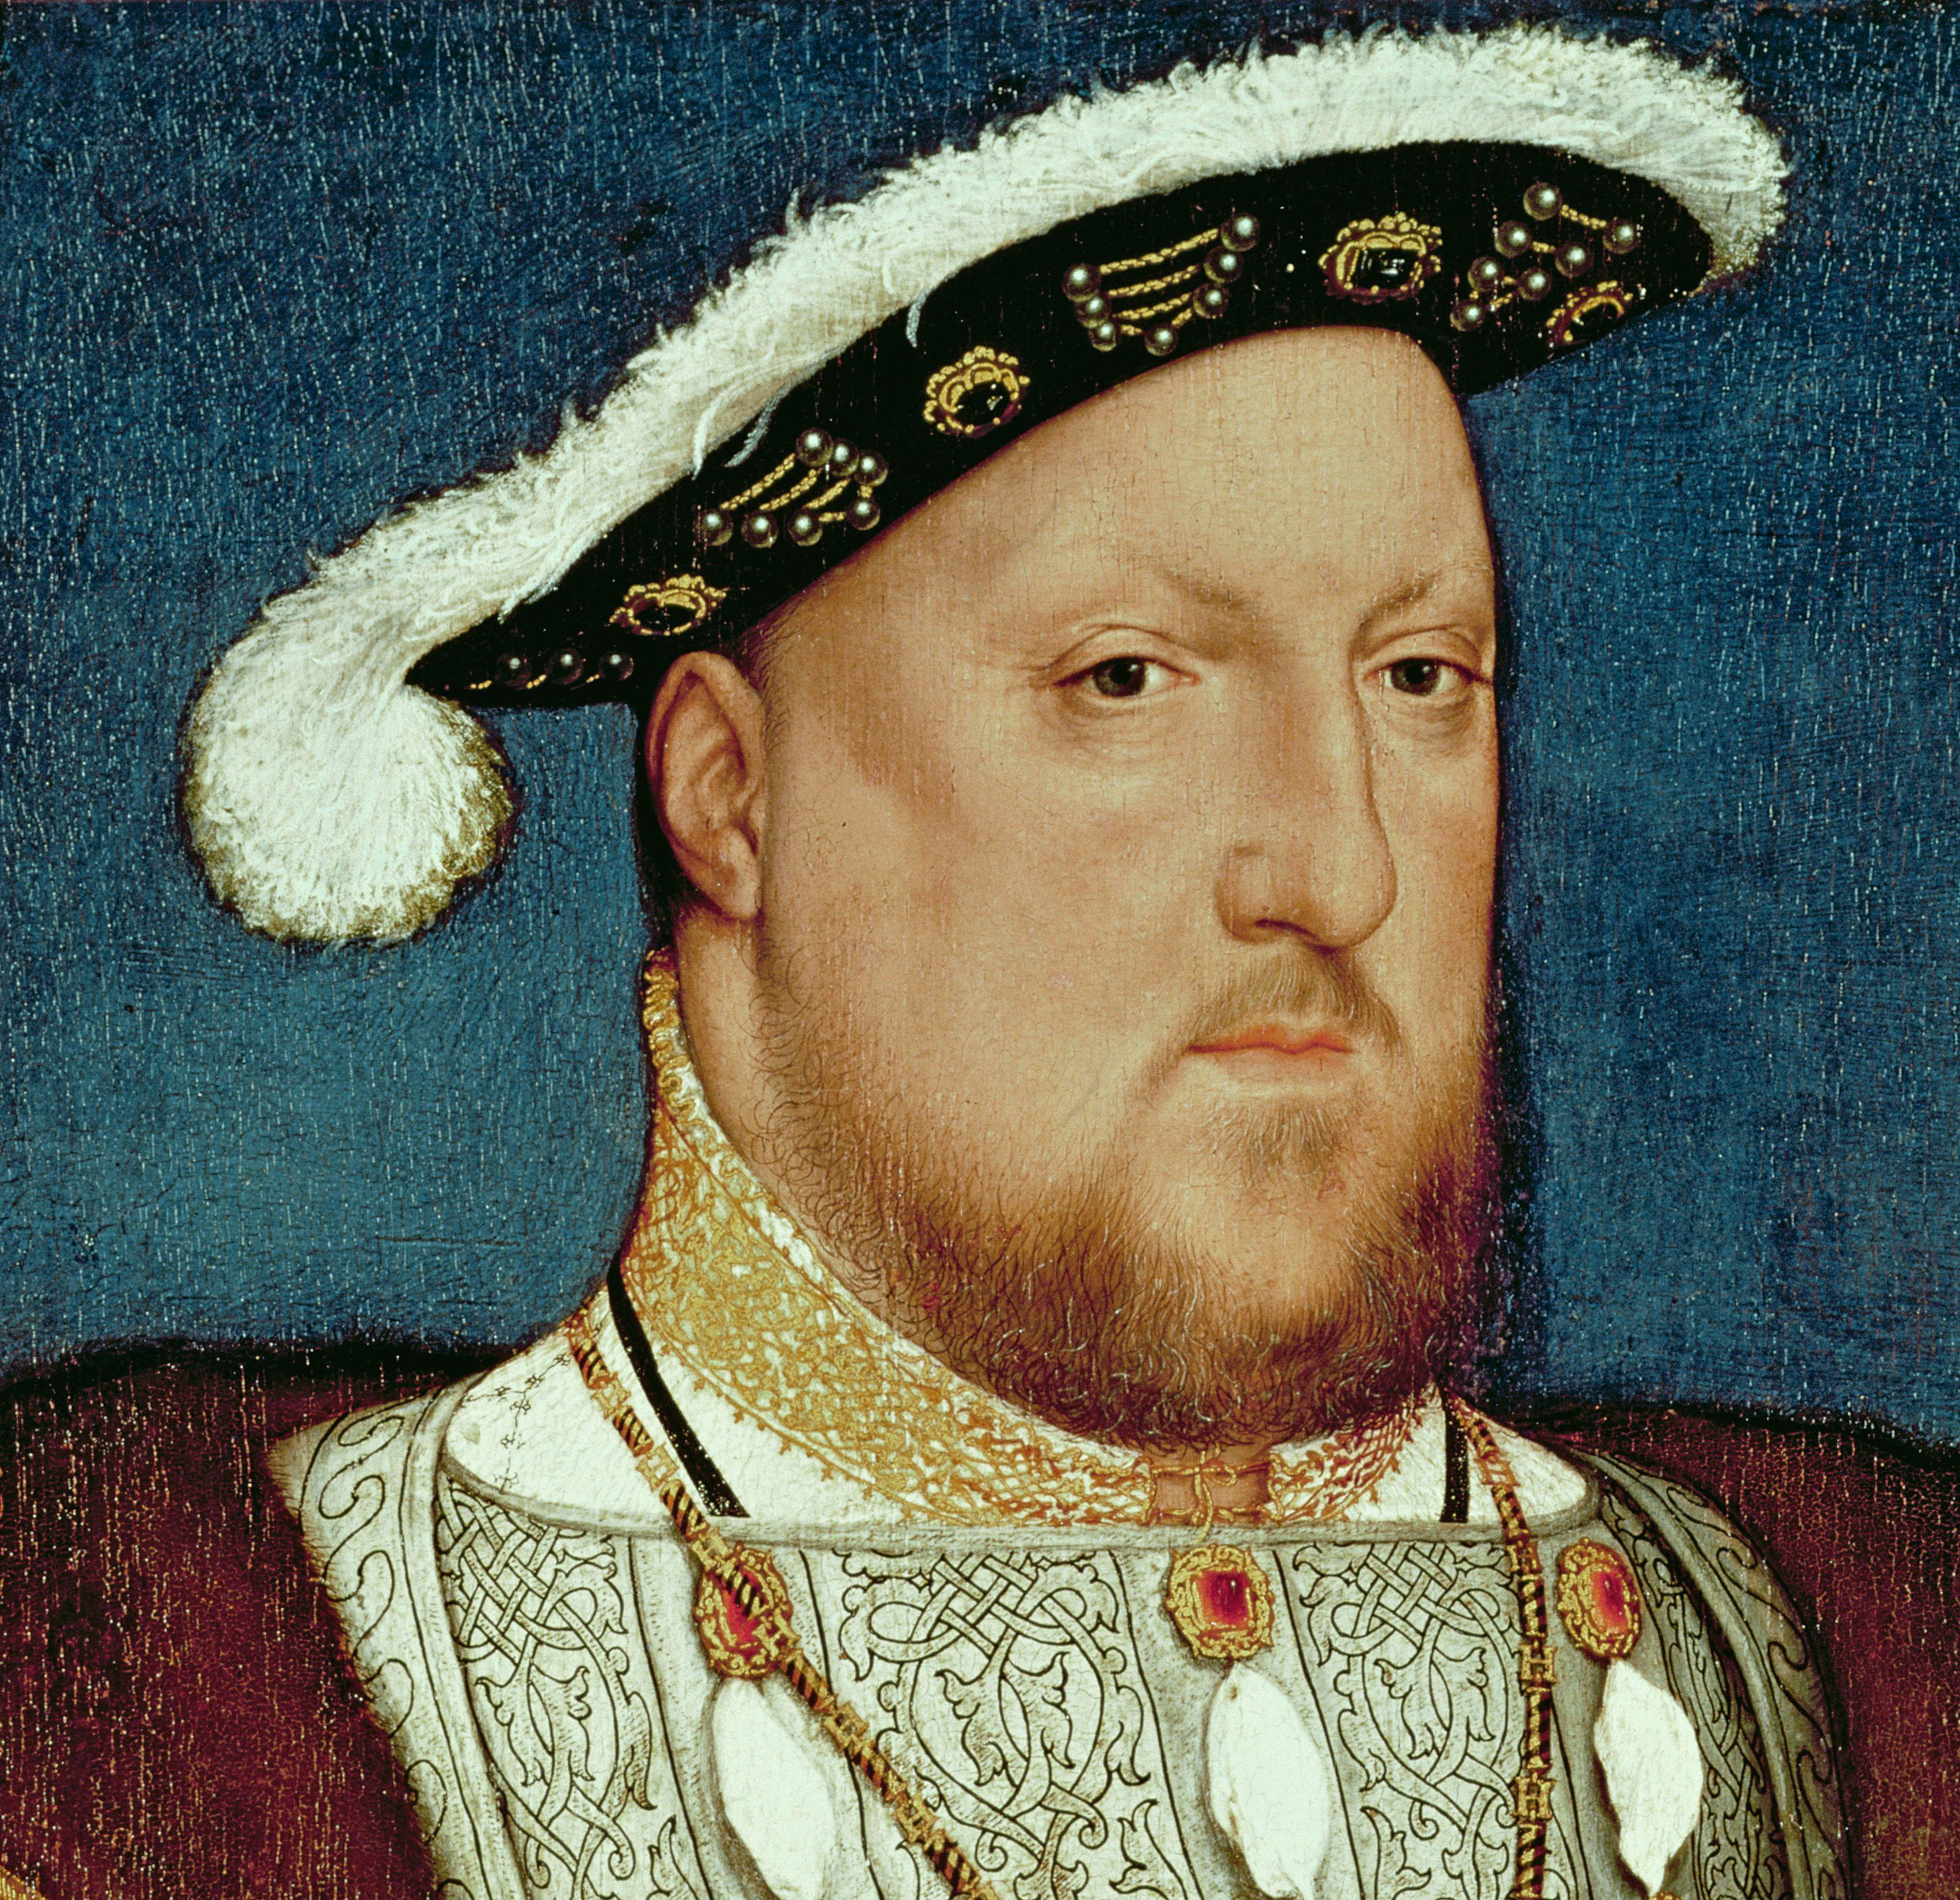 Oil on oak painting of King Henry VIII.